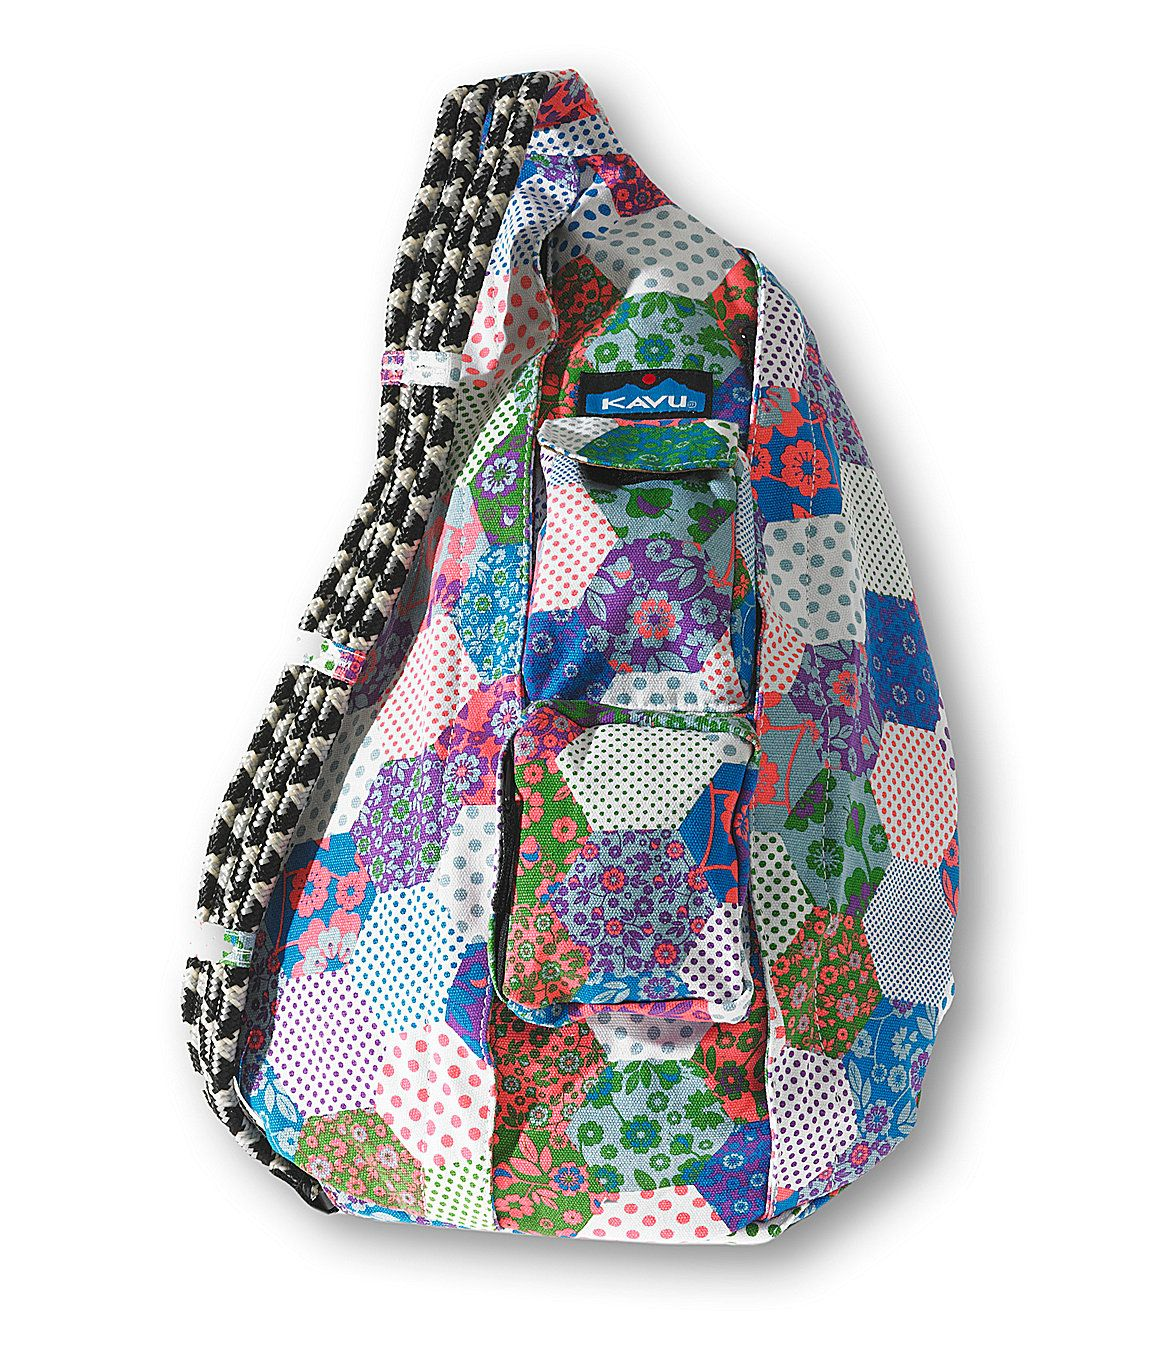 b839bad70d Kavu Printed Rope Messenger Bag